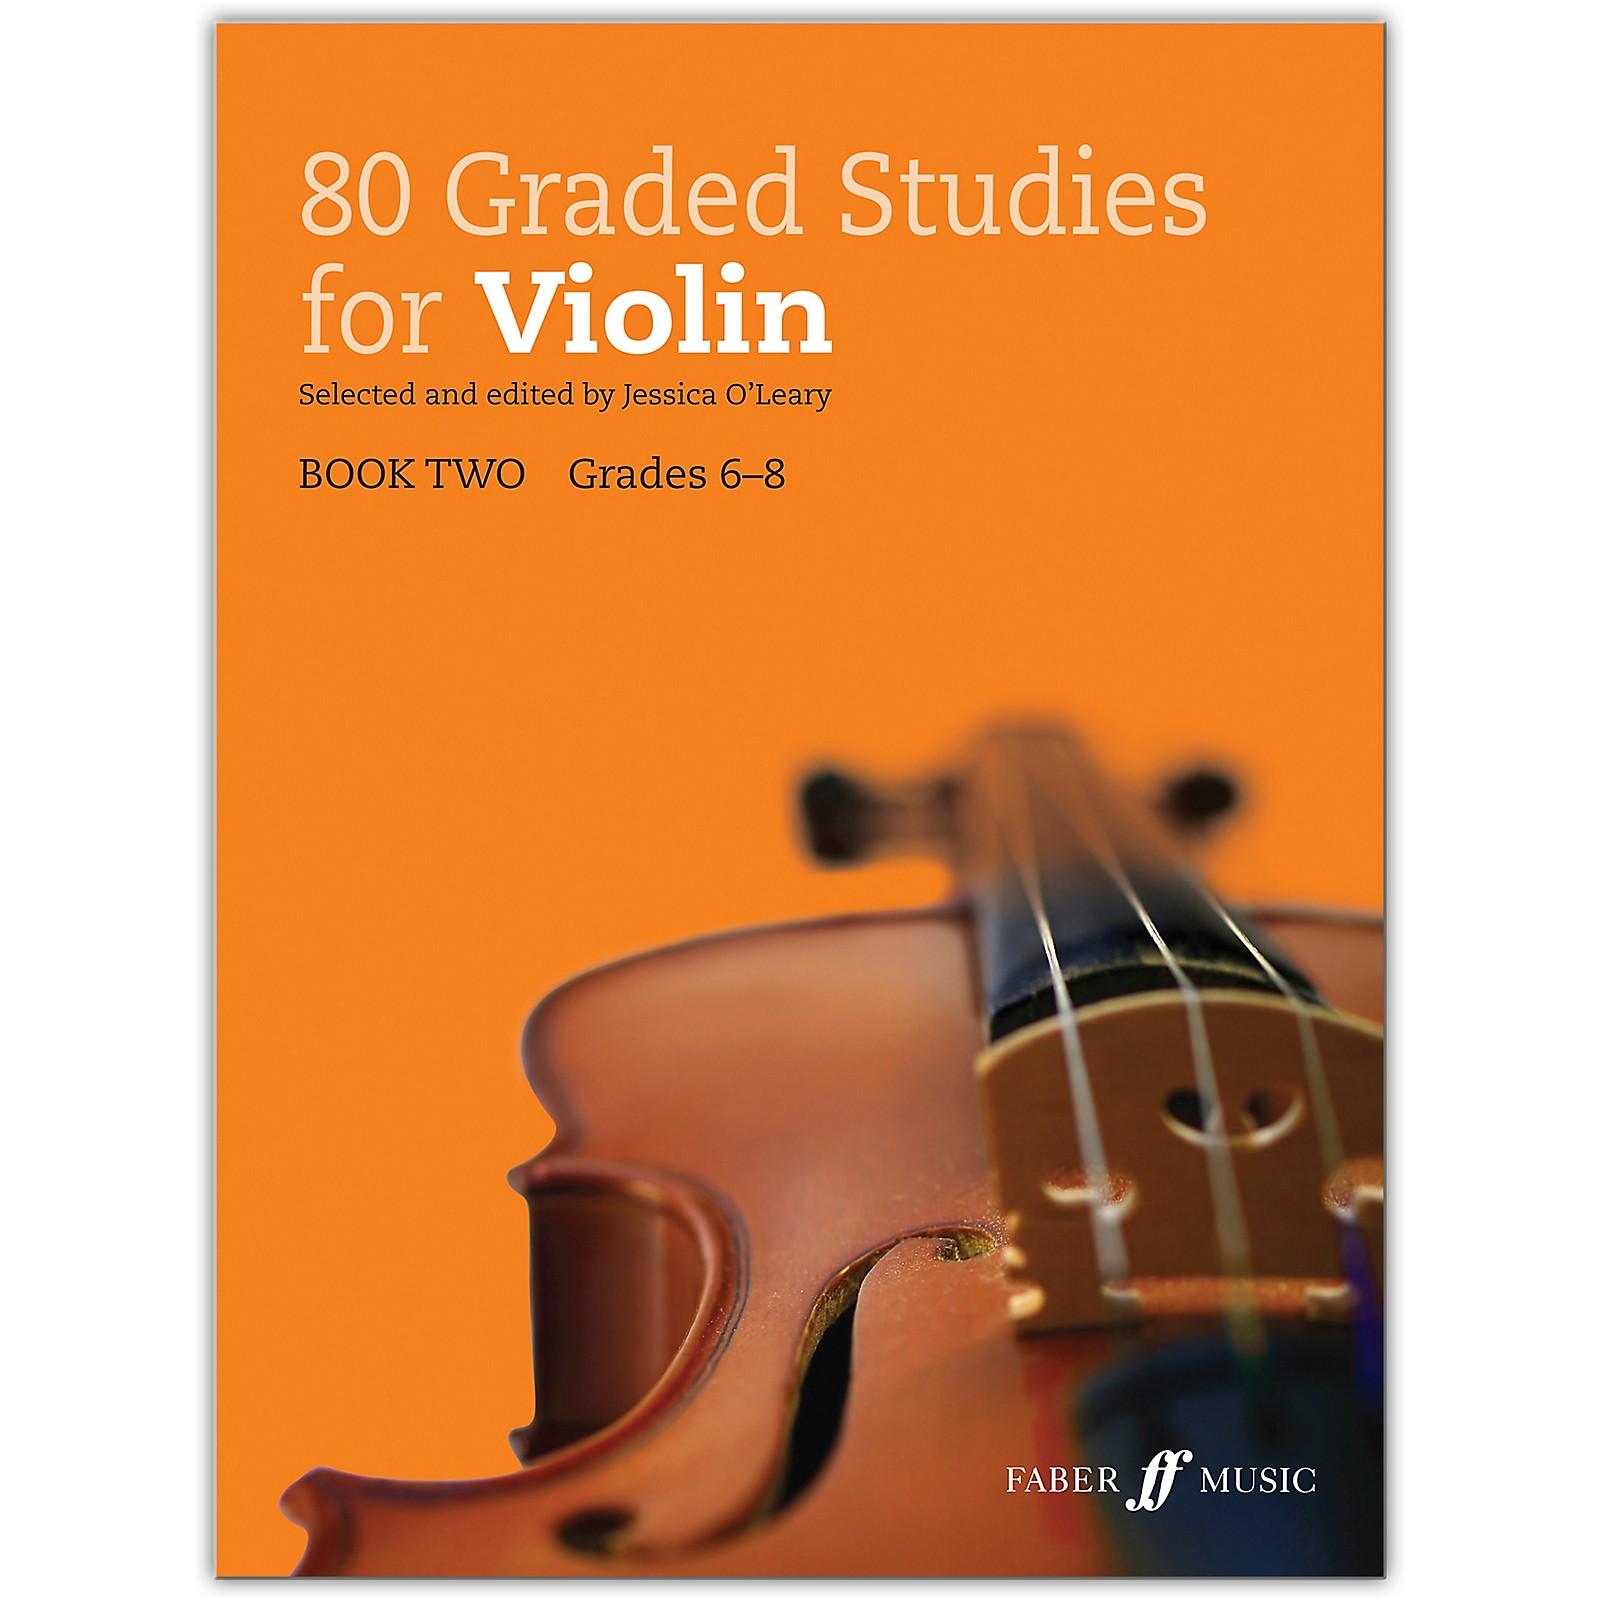 Faber Music LTD 80 Graded Studies for Violin, Book Two Grades 6-8